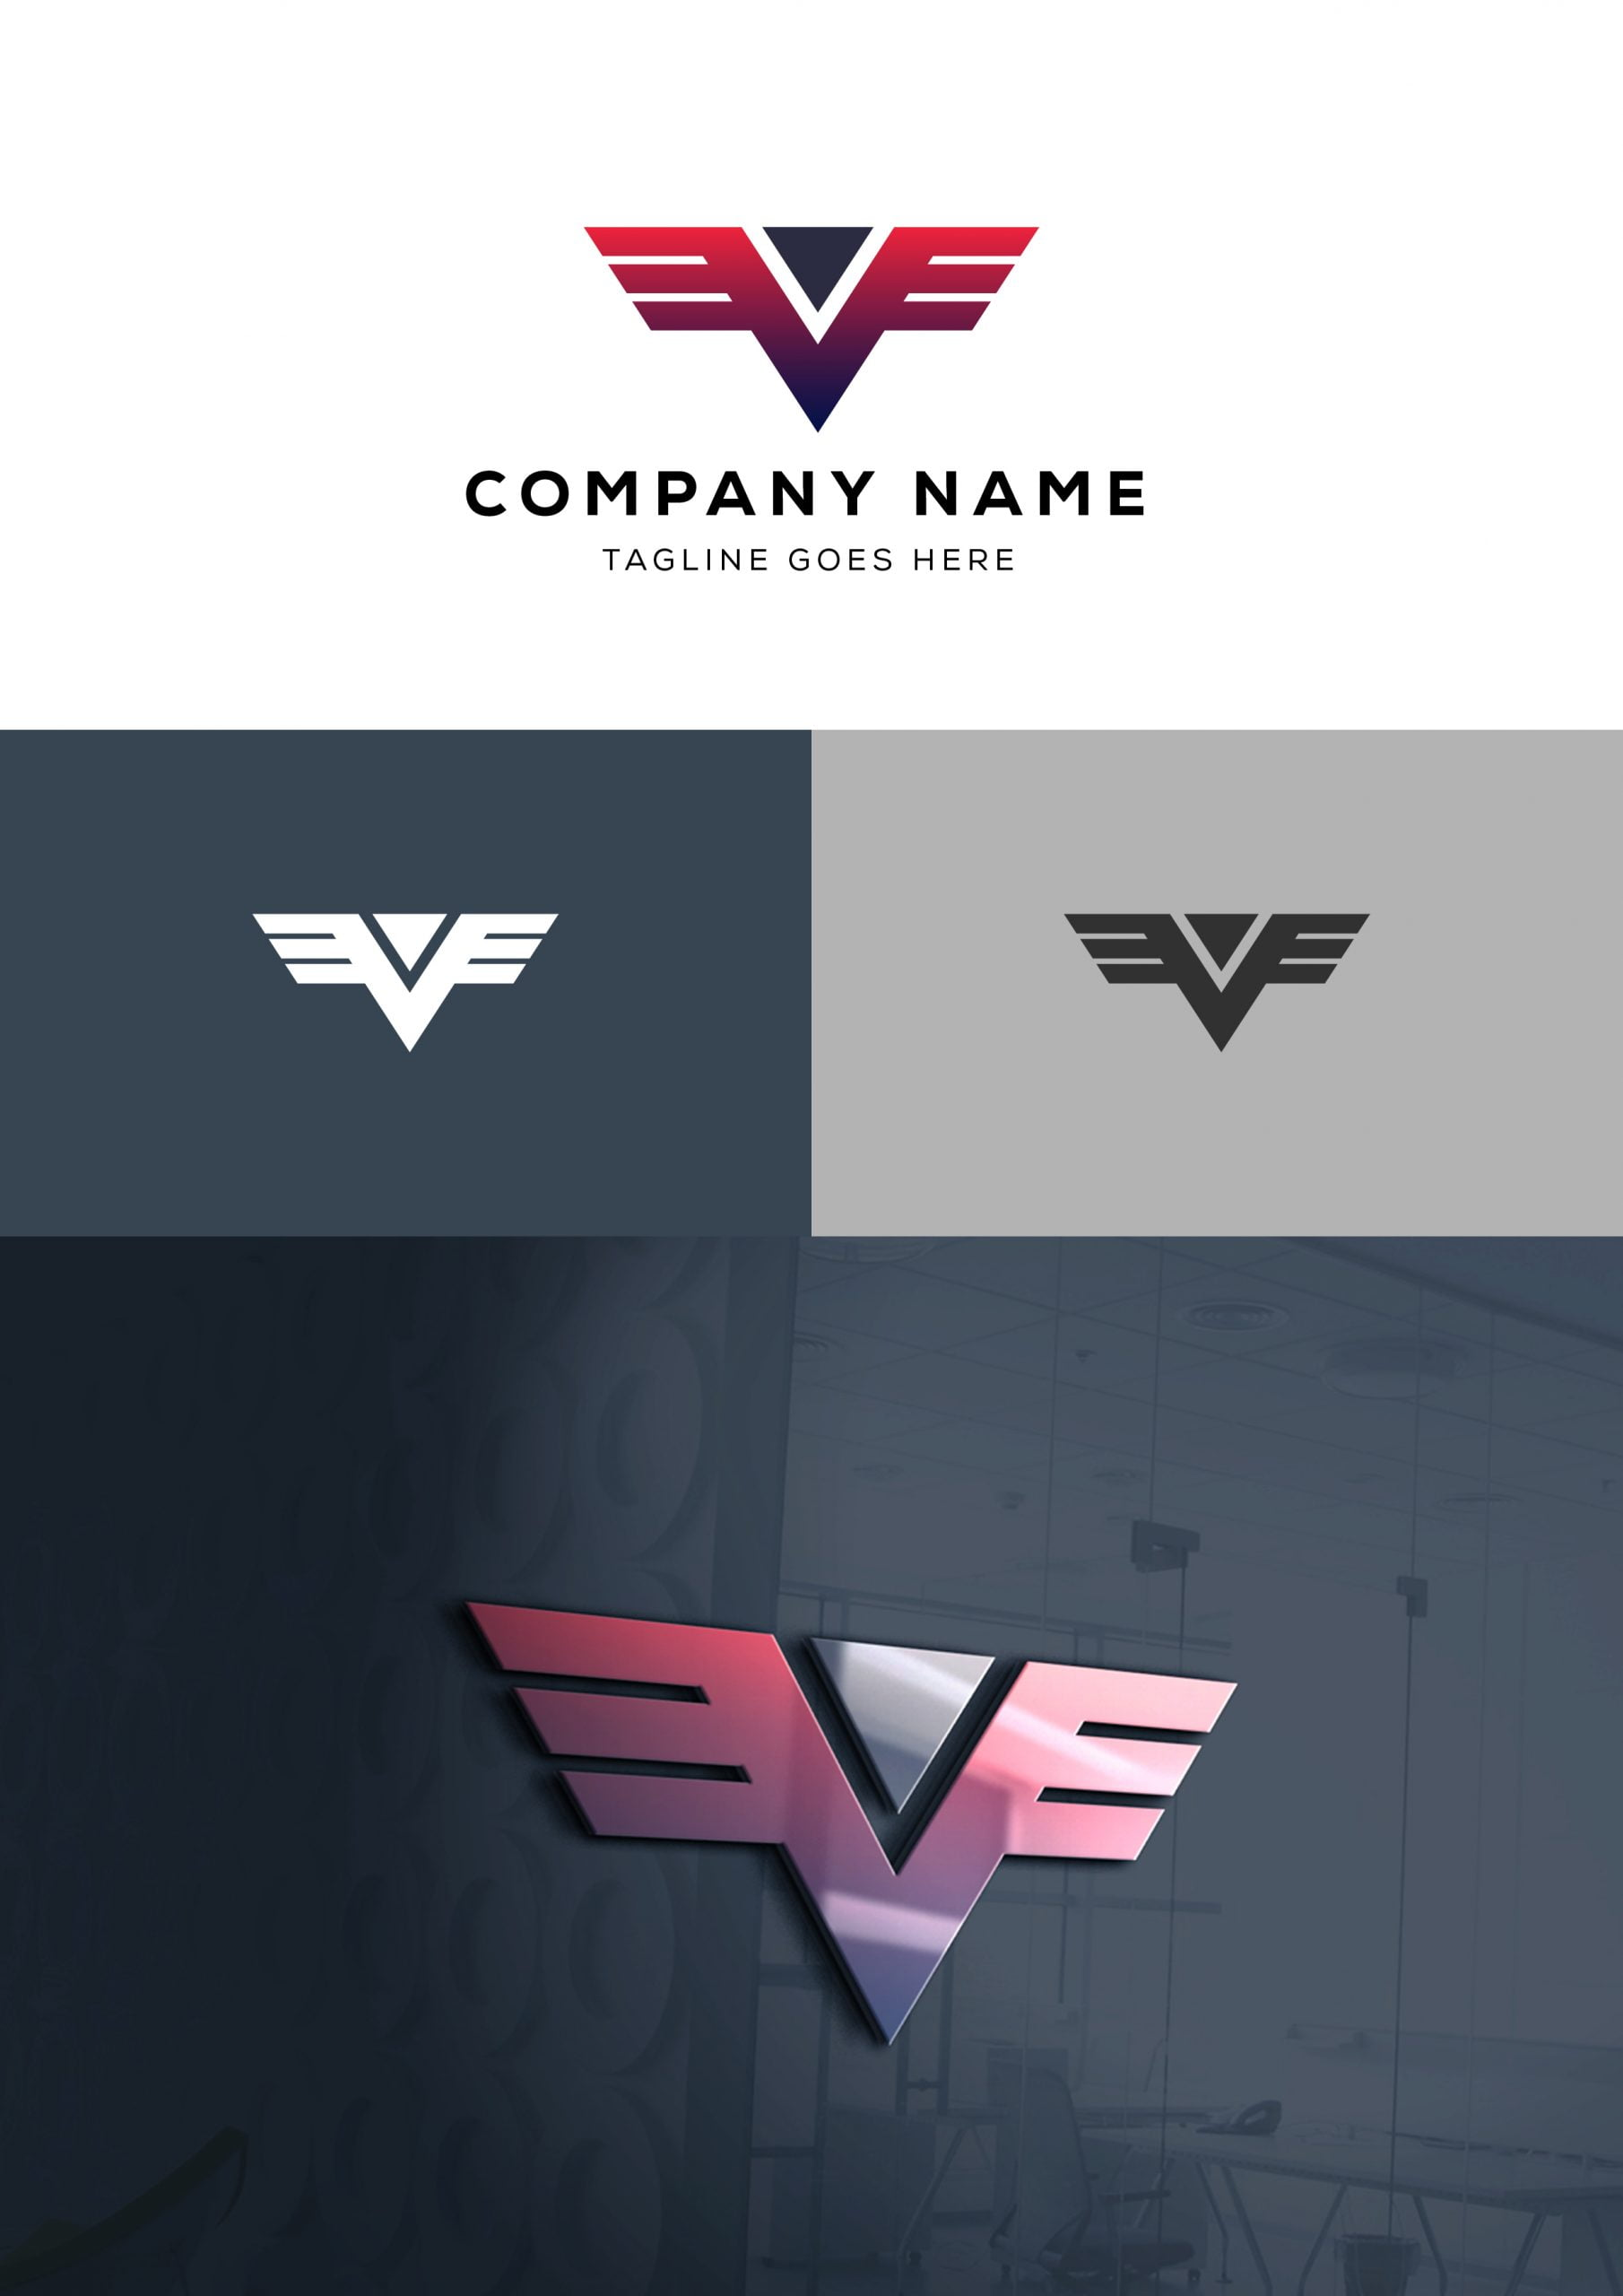 Free Professional Company Logo Design Template